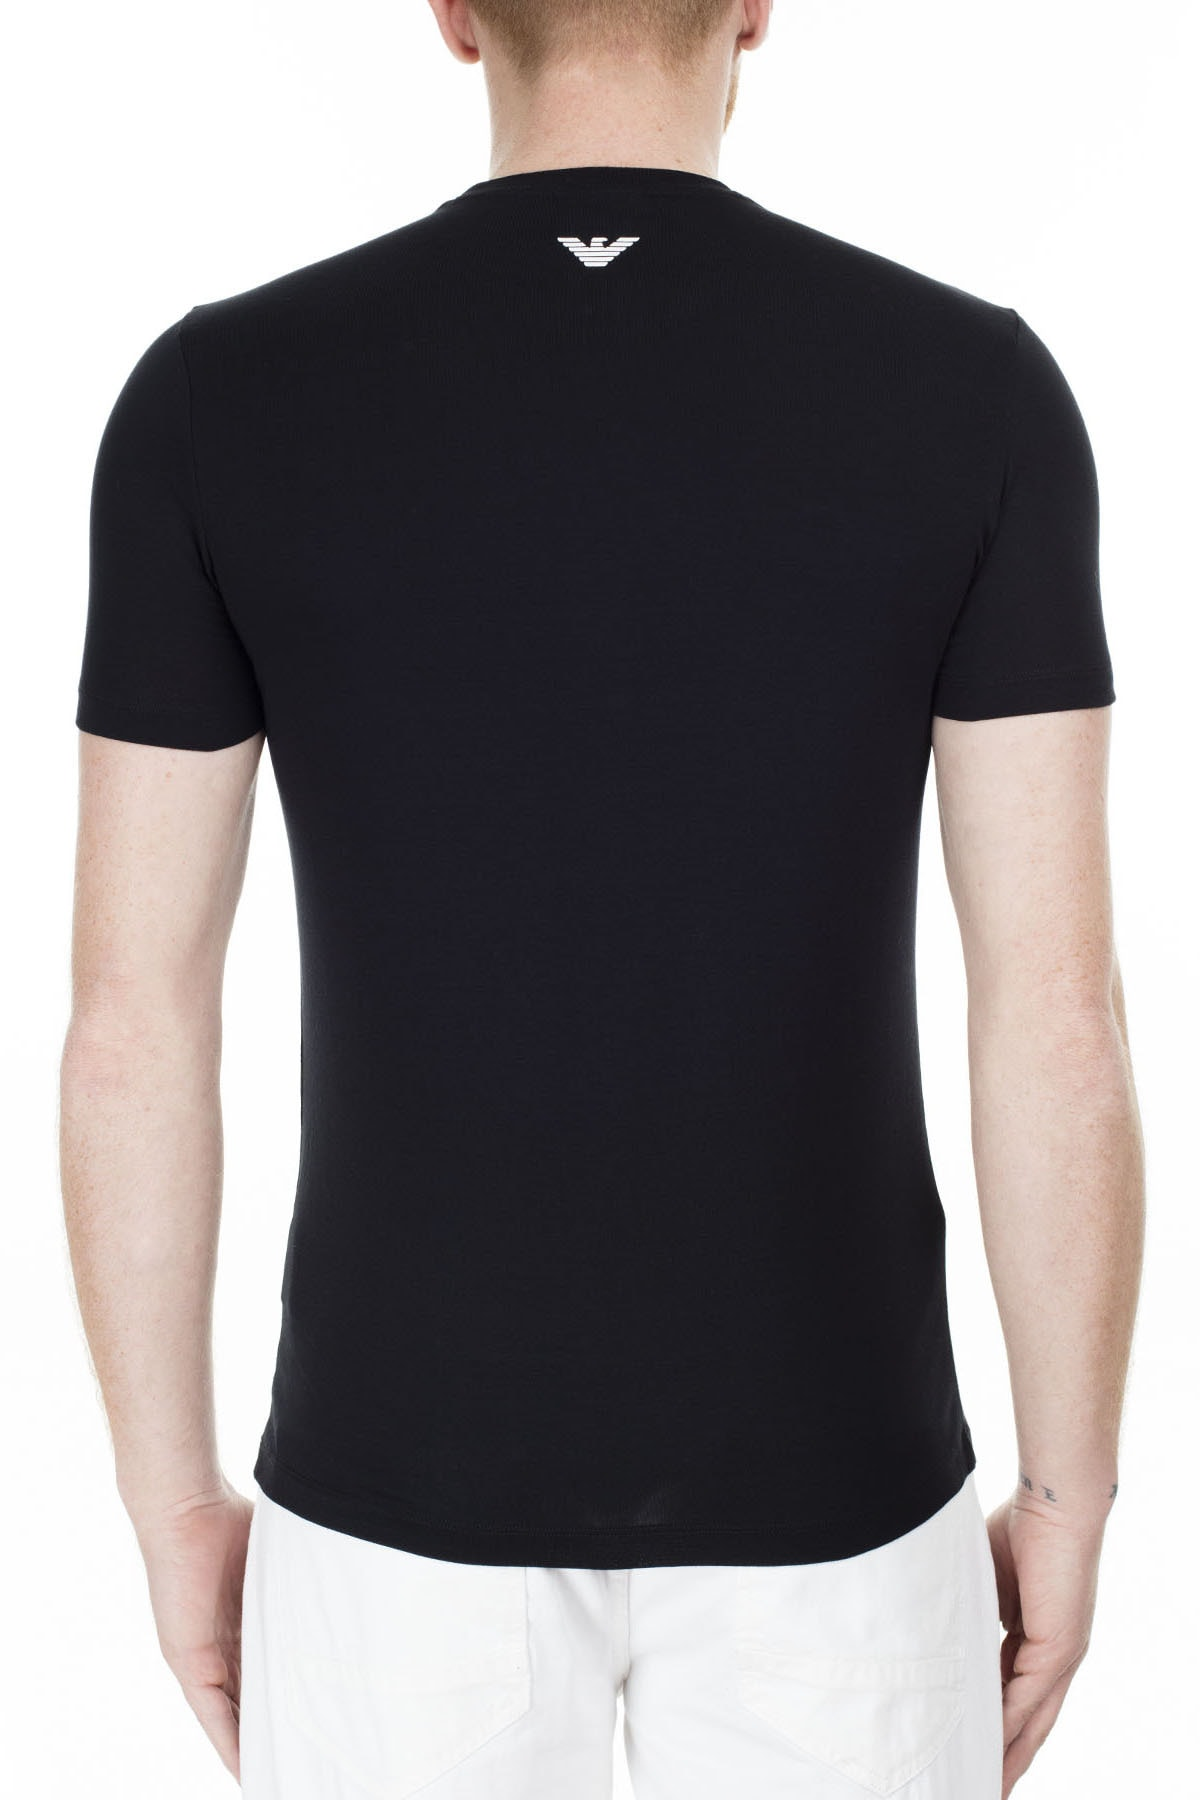 Emporio Armani Regular Fit T Shirt Erkek T Shirt S 6G1Td5 1J0Az 0002 S 6G1TD5 1J0AZ 0002 1